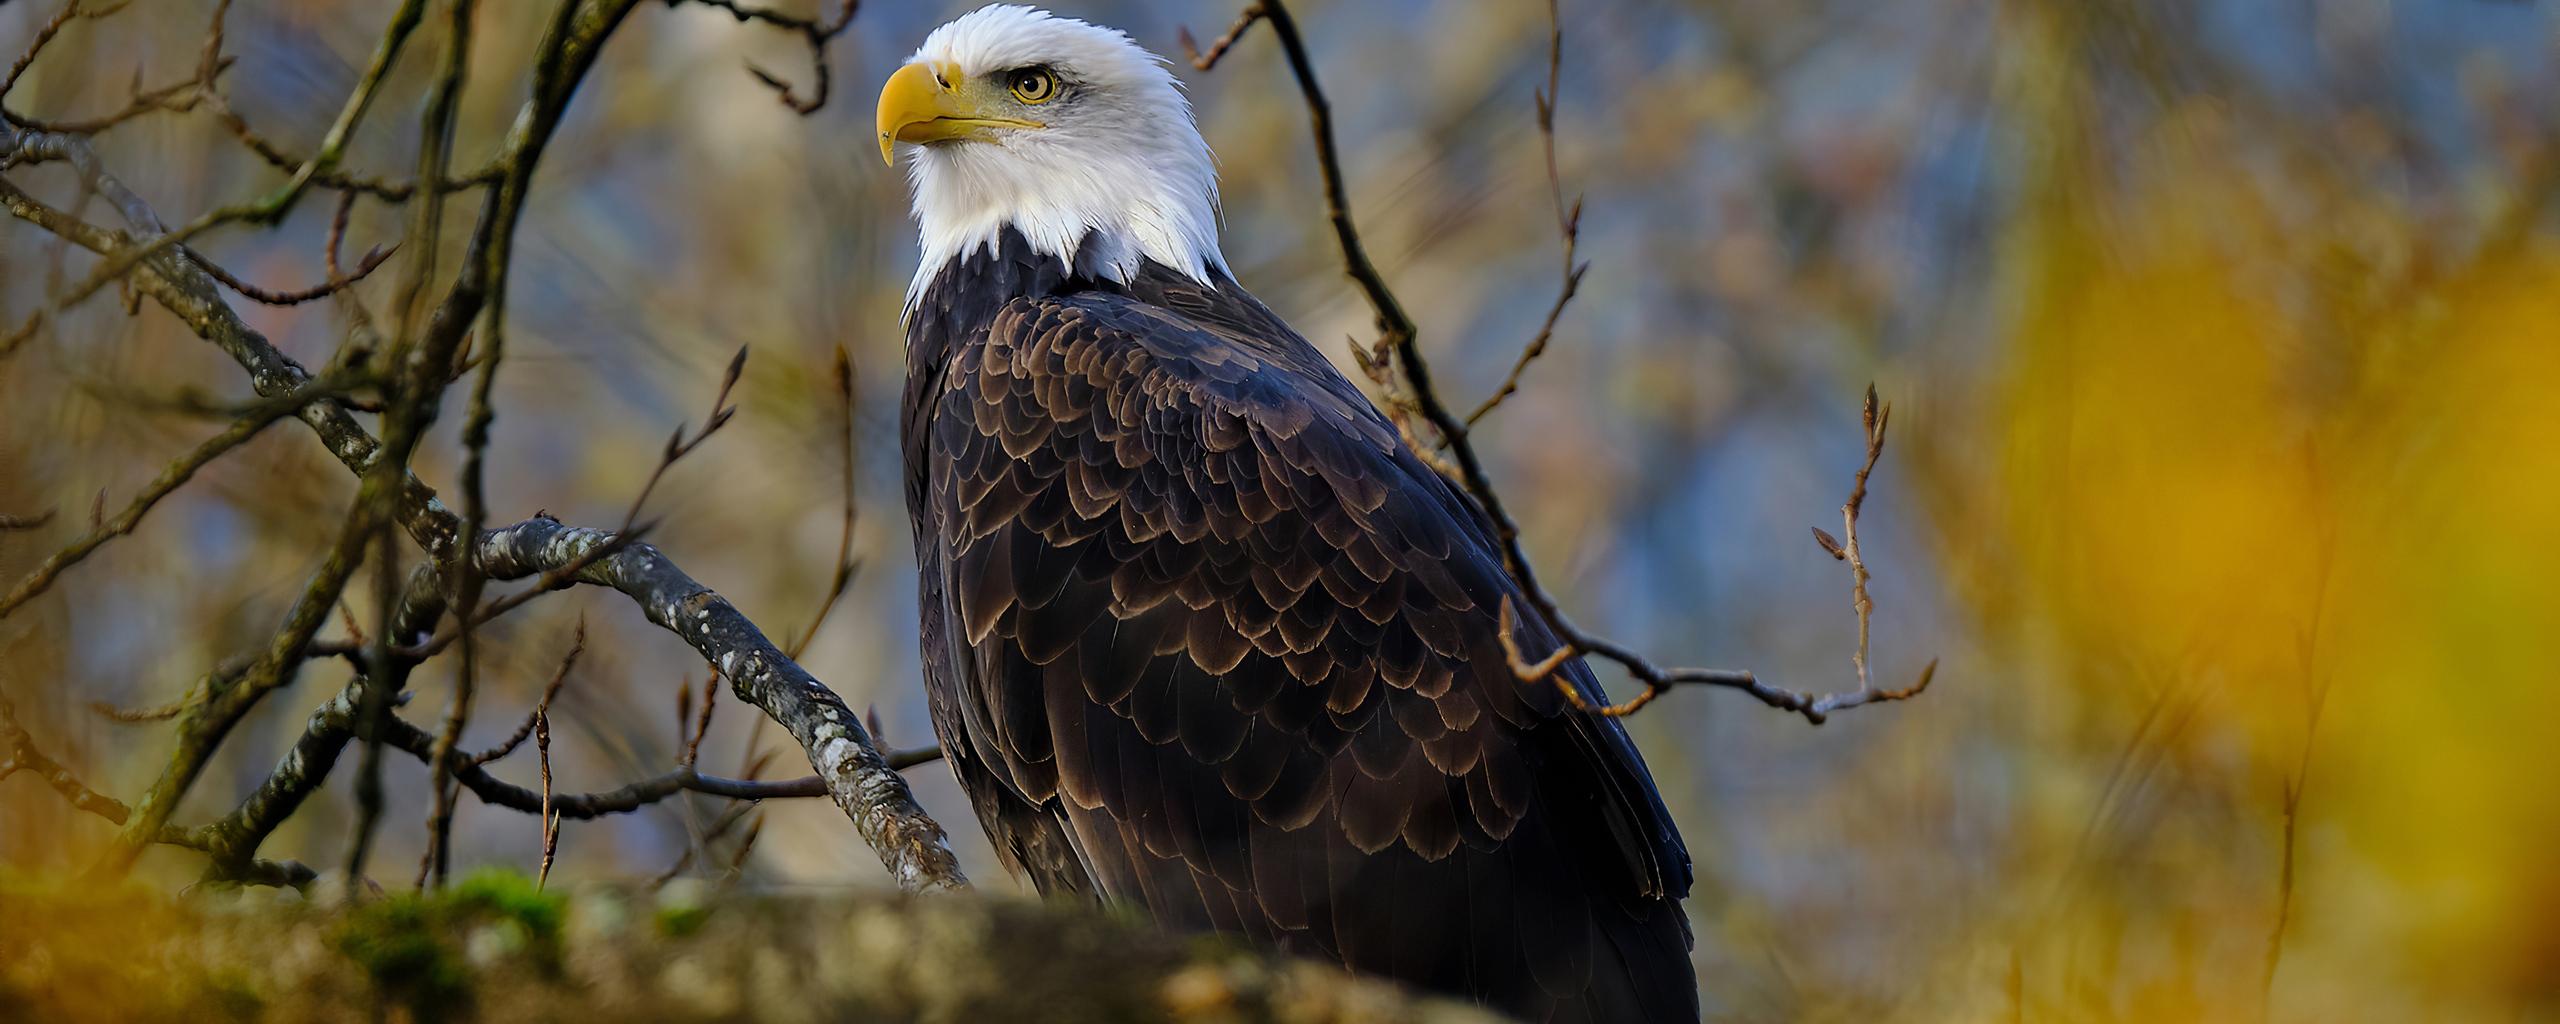 bald-eagle-hawk-4k-rb.jpg